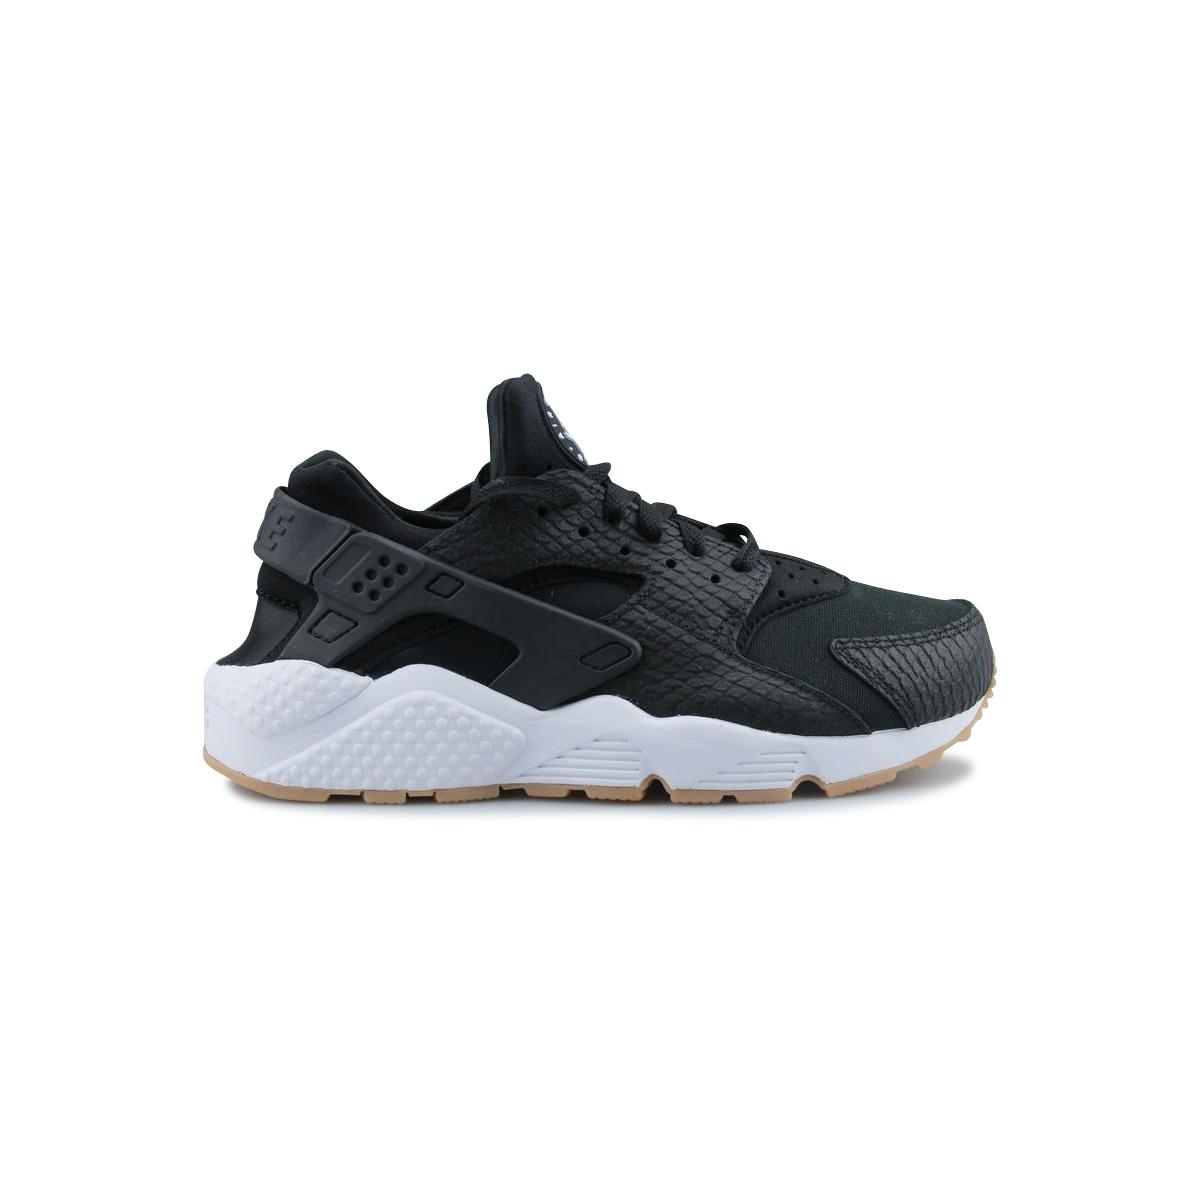 later footwear buying cheap WMNS NIKE AIR HUARACHE RUN SE NOIR 859429-005 - oshooz.fr